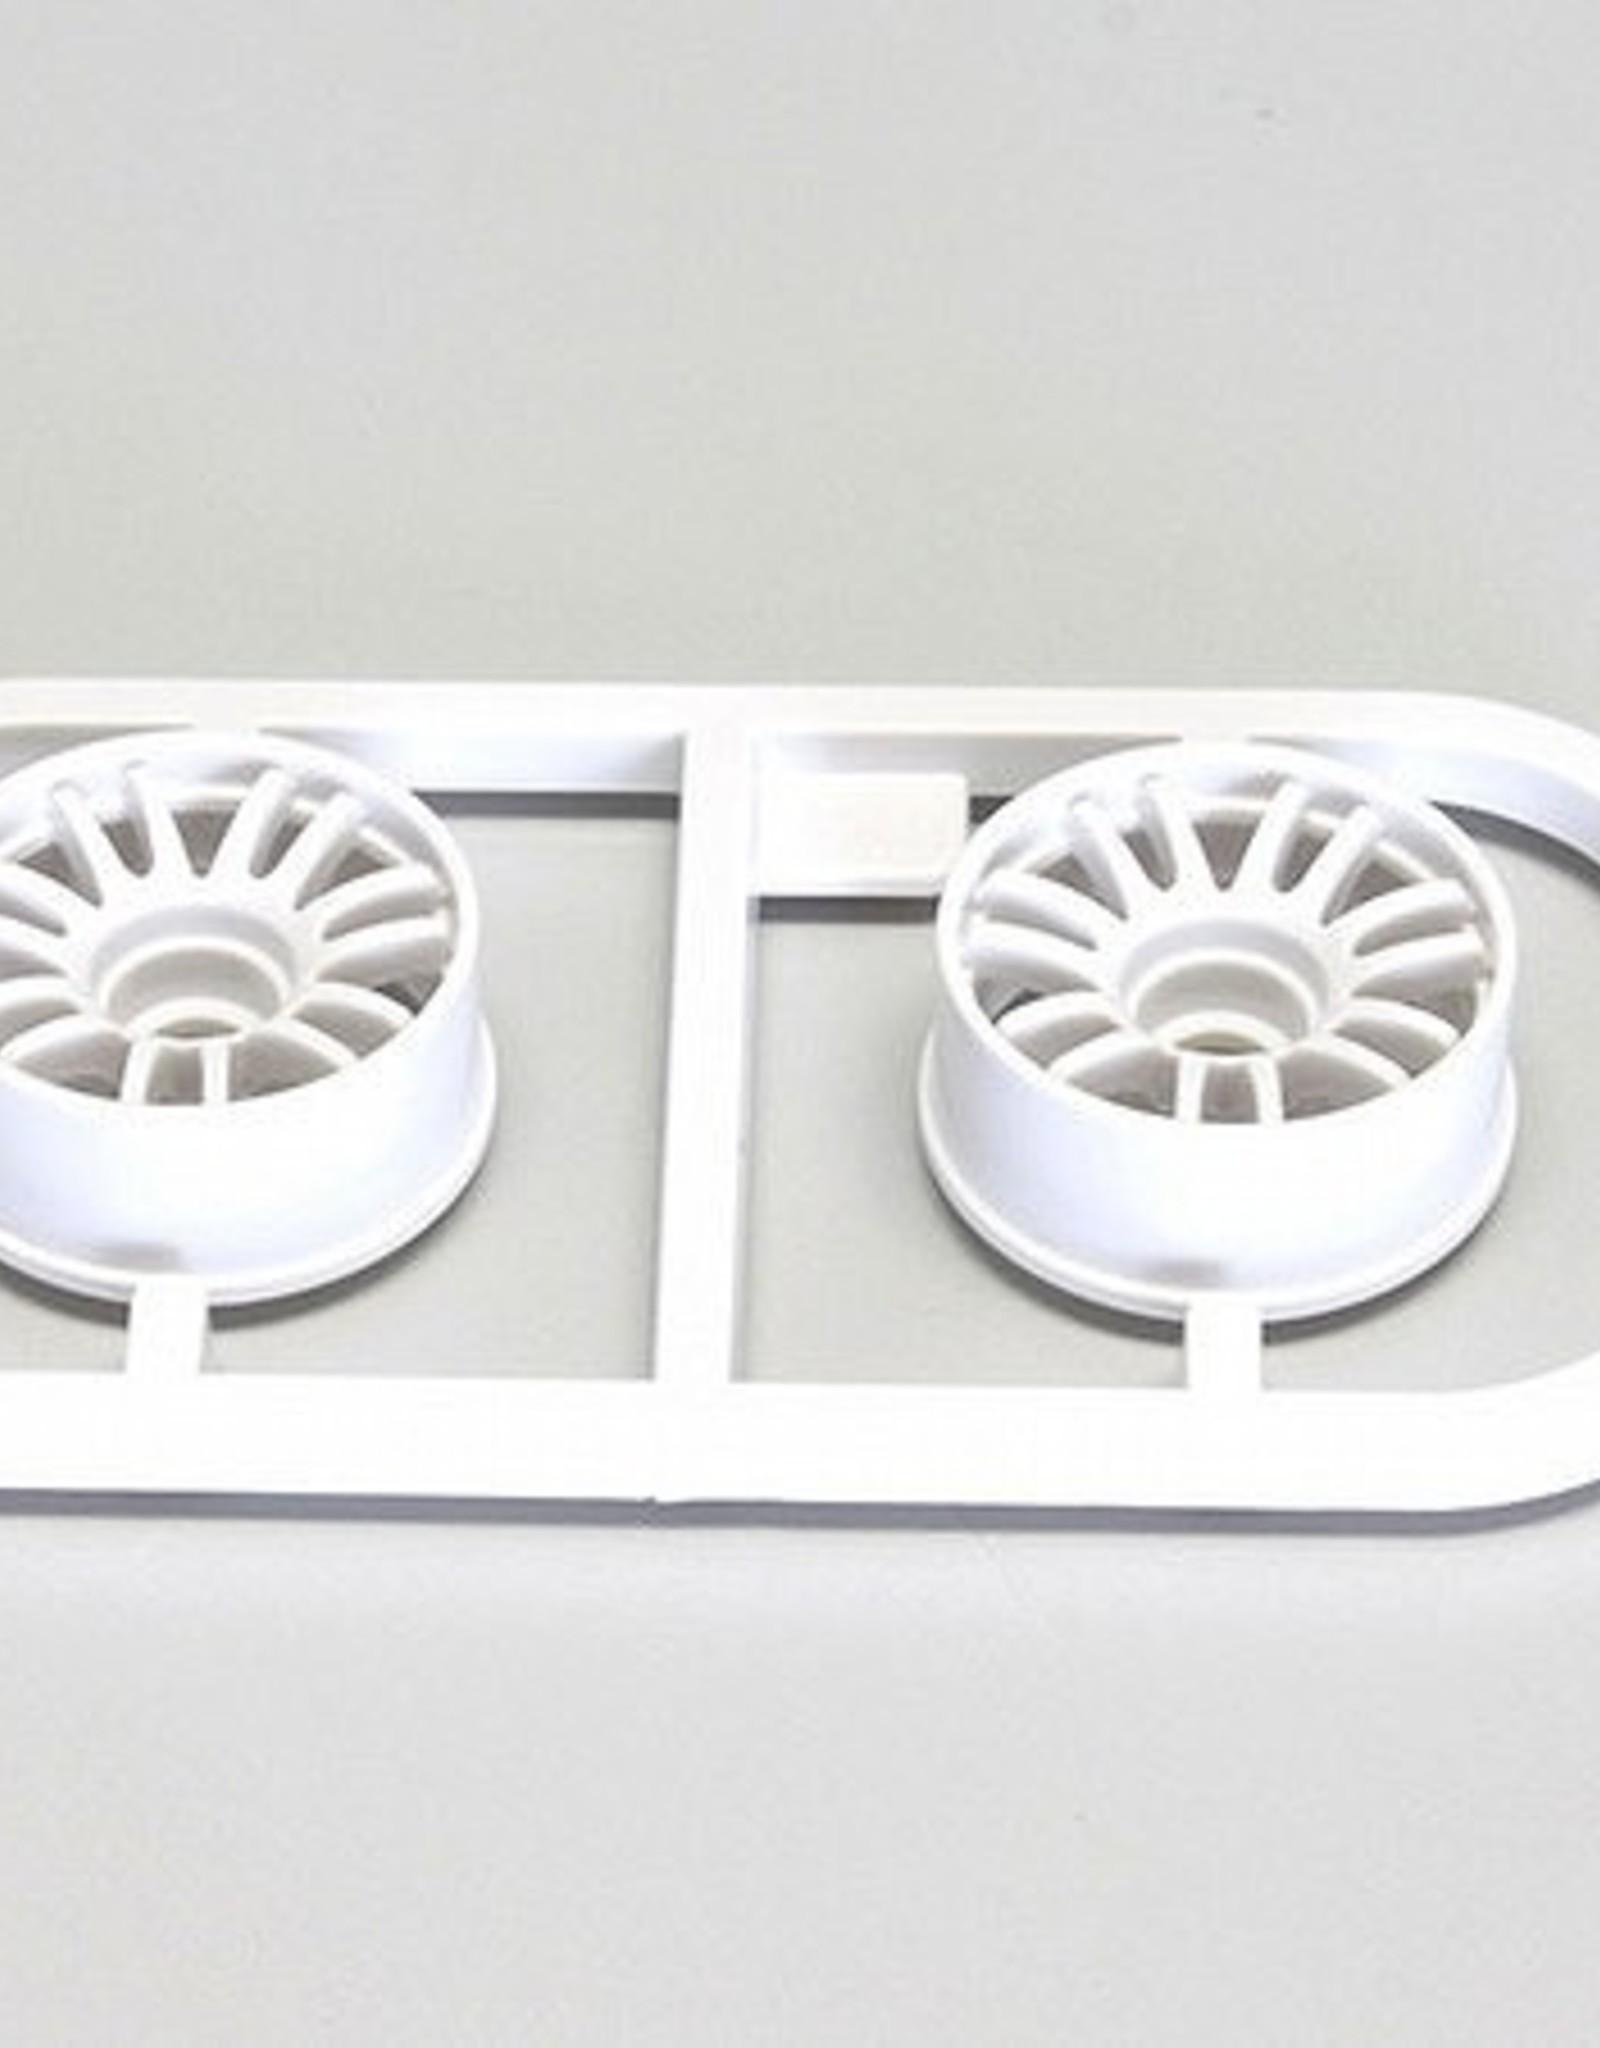 Kyosho Kyosho Multi Wheel II N/Offset 1.5(White/RE30/2pcs)